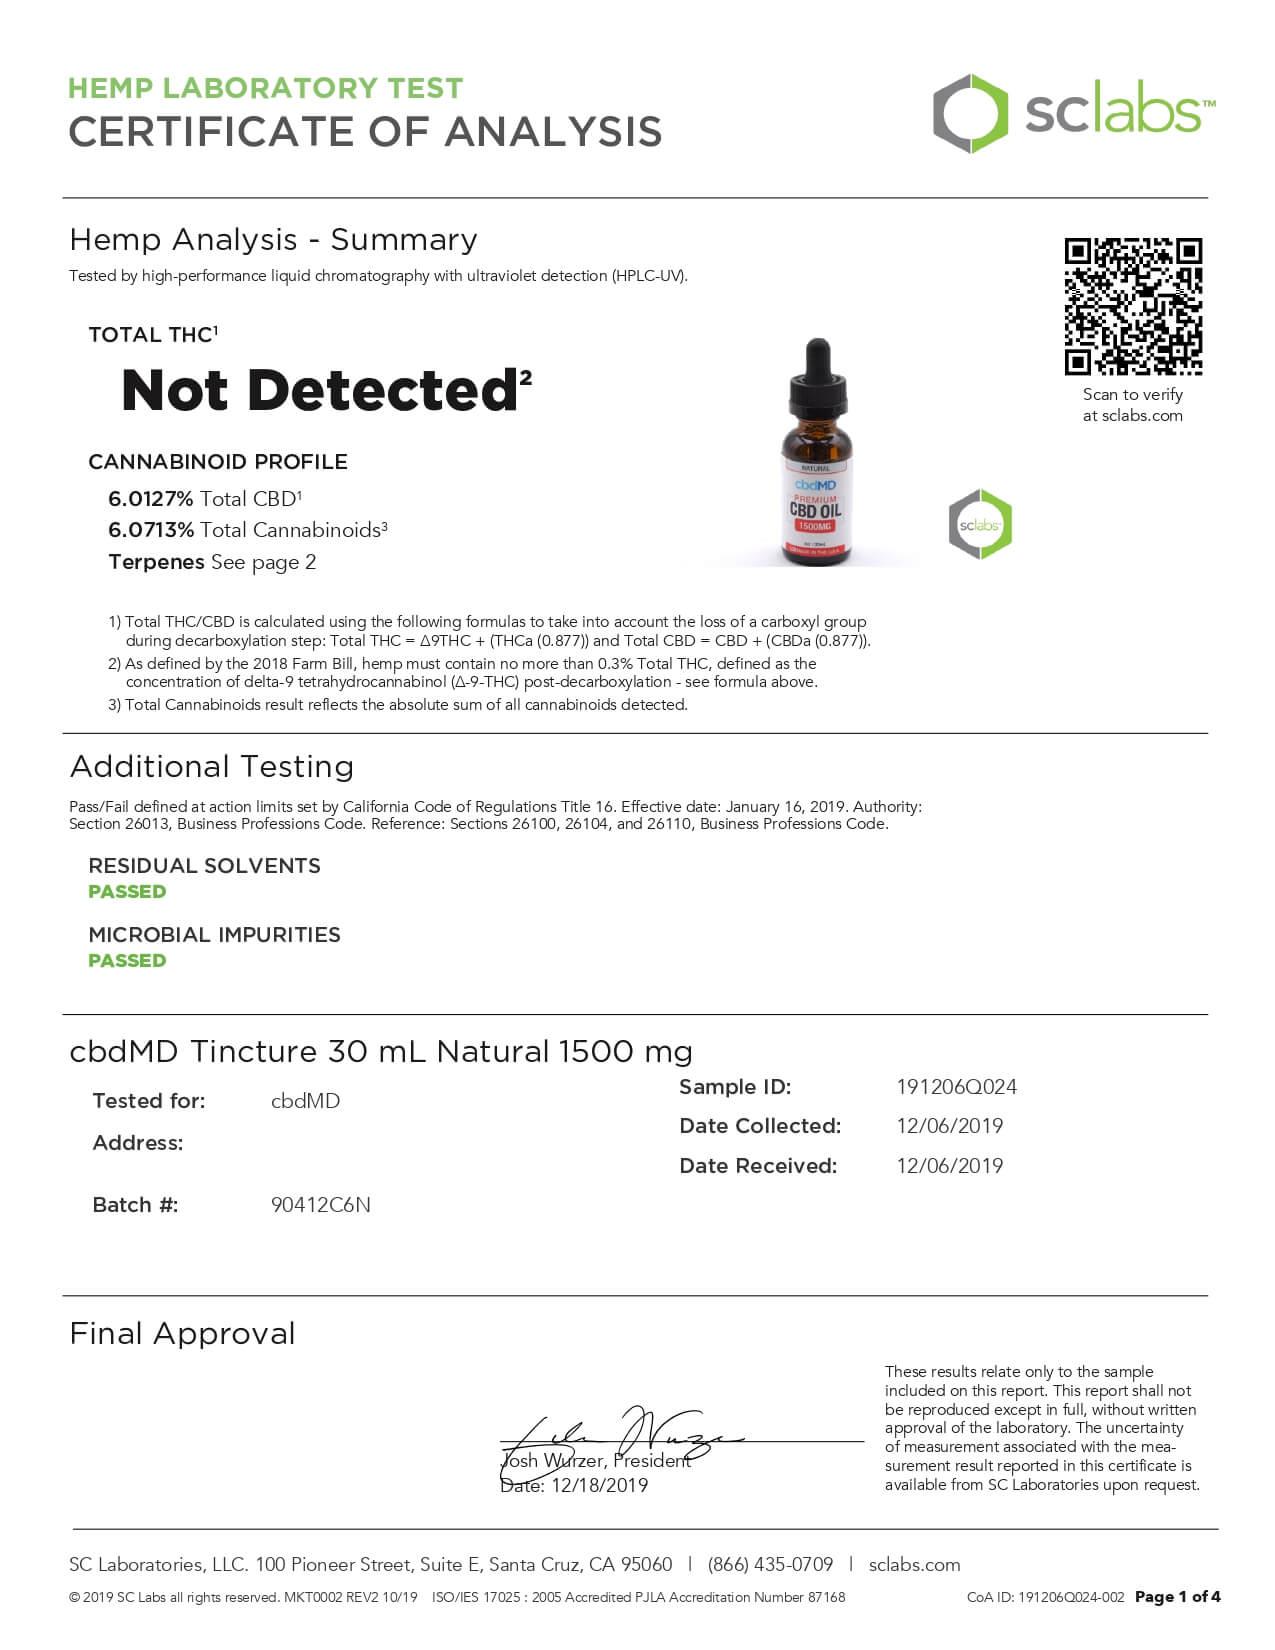 cbdMD CBD Tincture Broad Spectrum Orange 30ml 1500mg Lab Report